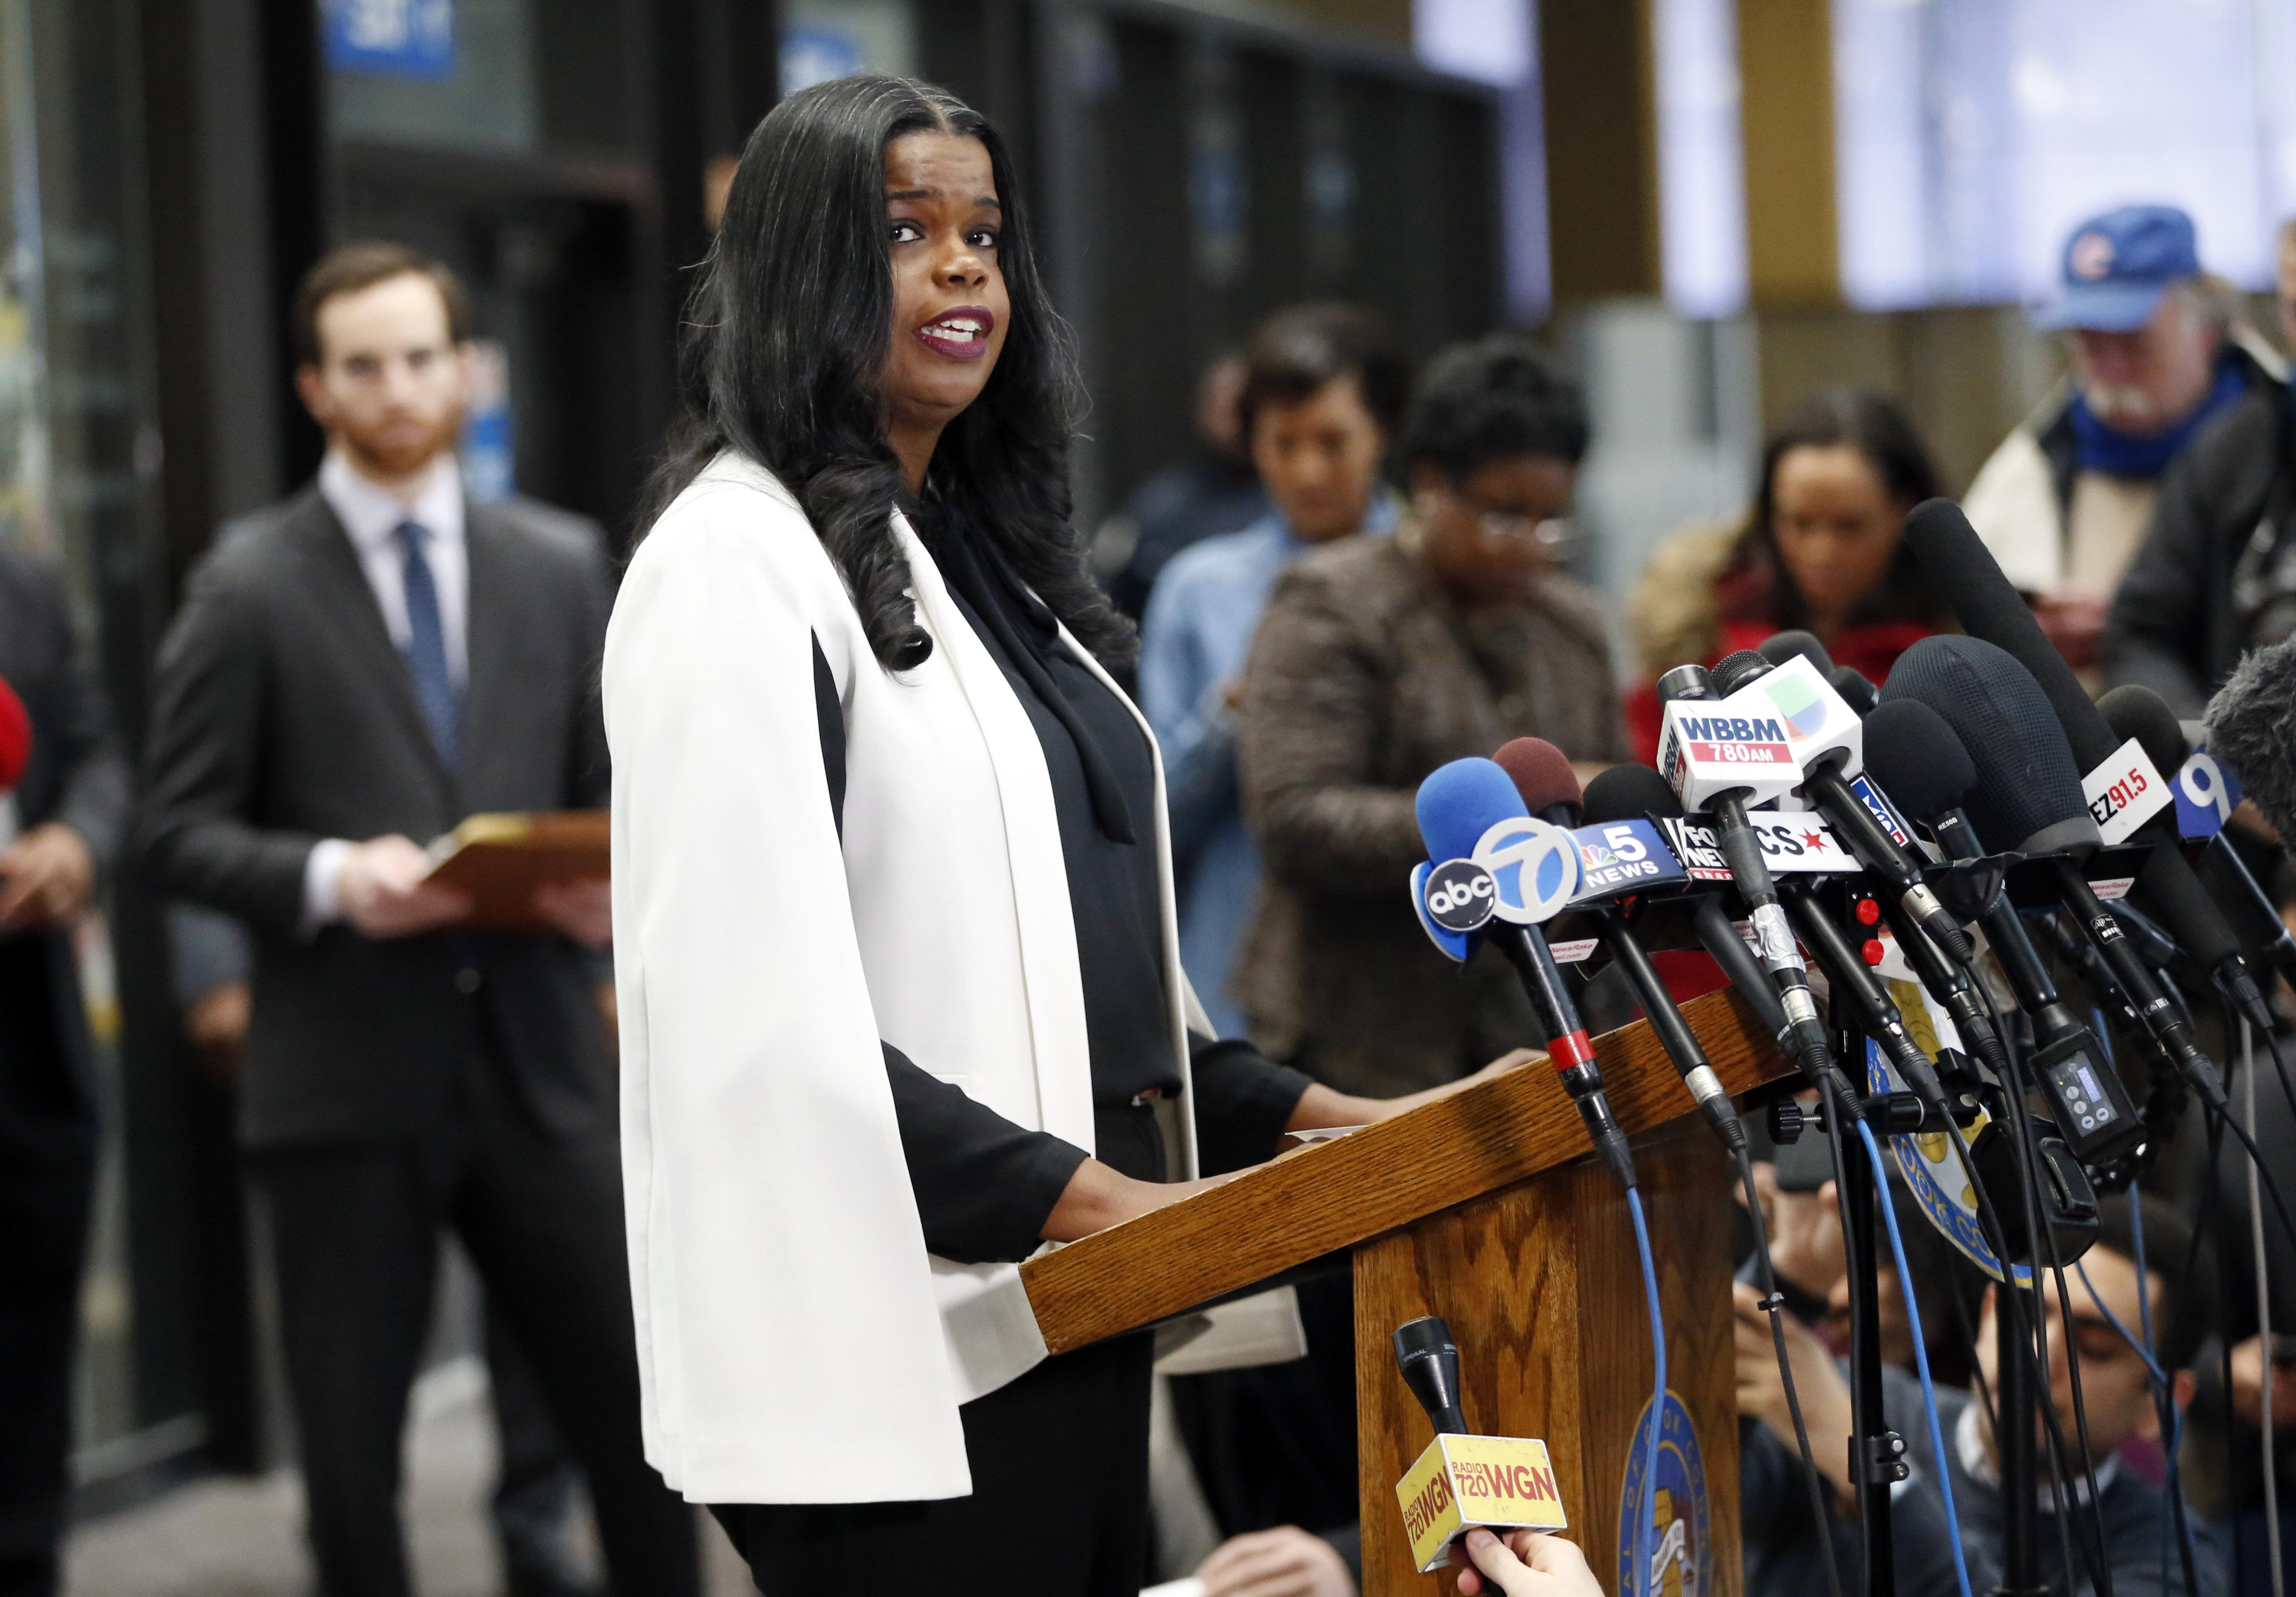 Prosecutor Handling Jussie Smollett Case Says She Wont Speak About It Yet